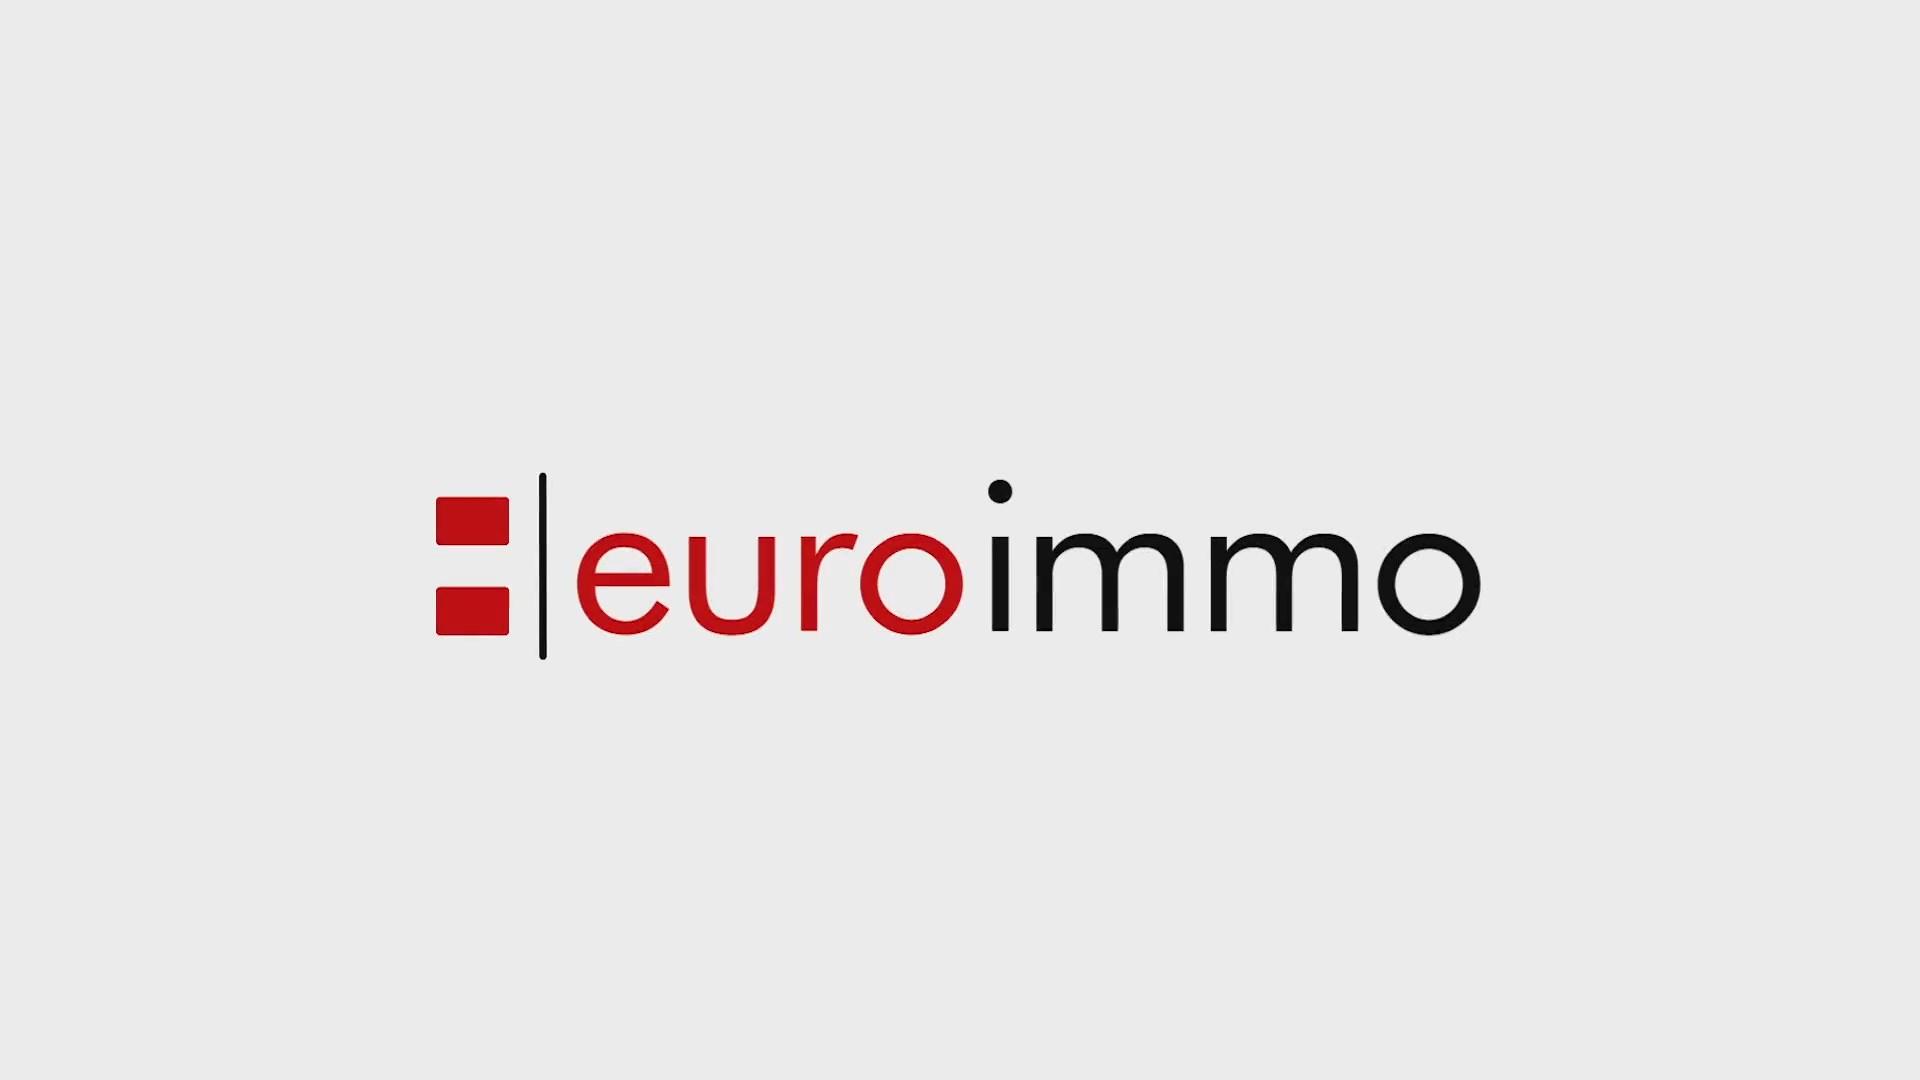 euroimmo-afrekening